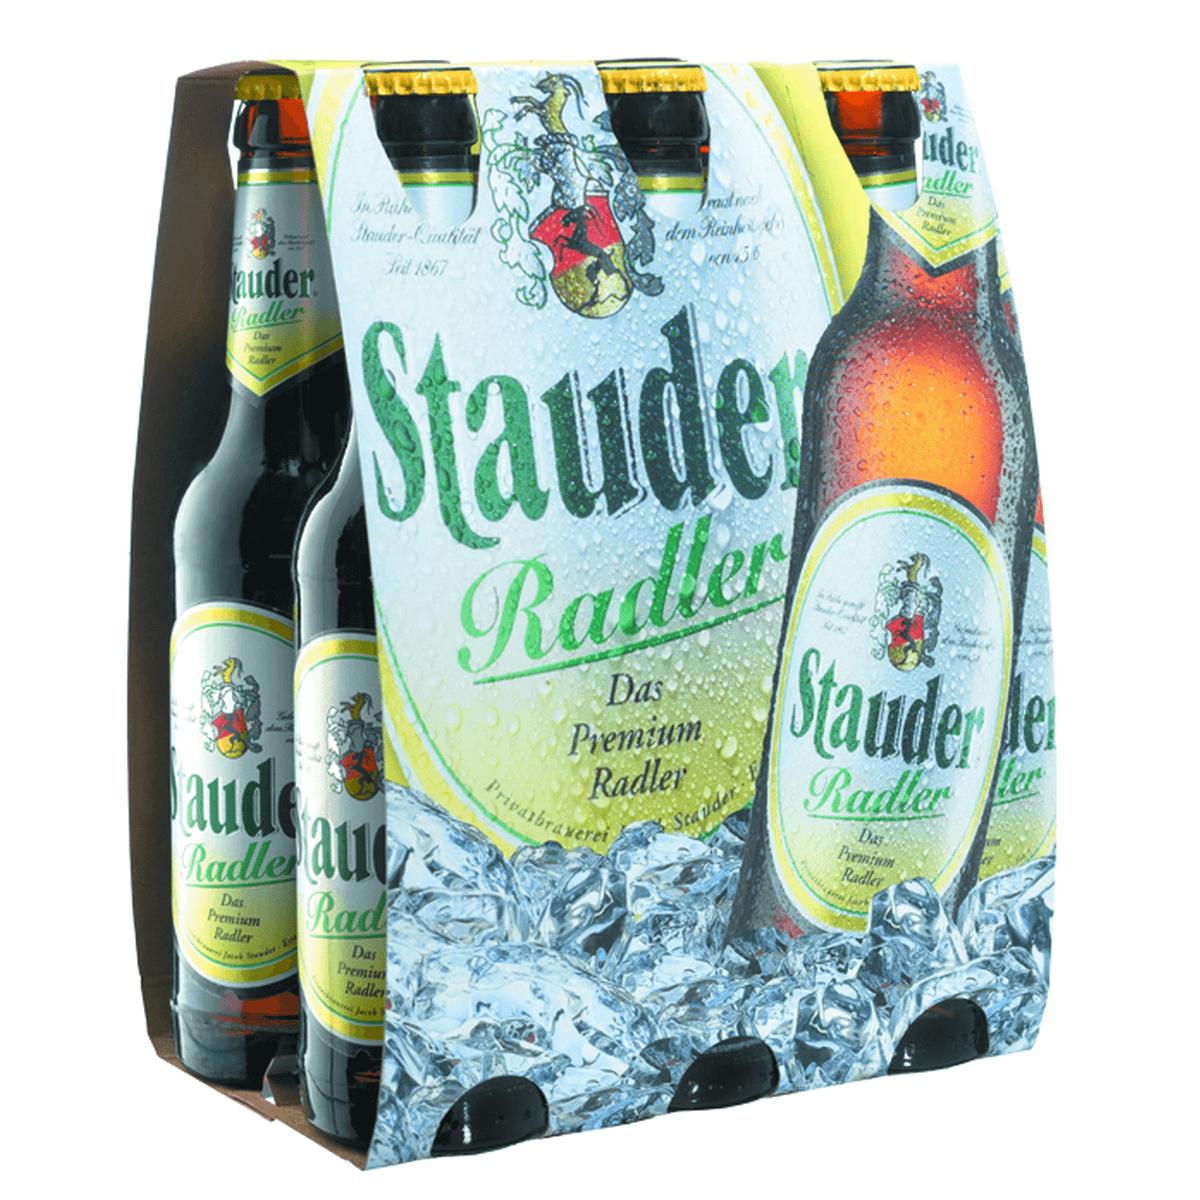 Stauder Radler 6 x 0,33L | Biermixgetränke | Bier | Sortiment | Trinkgut